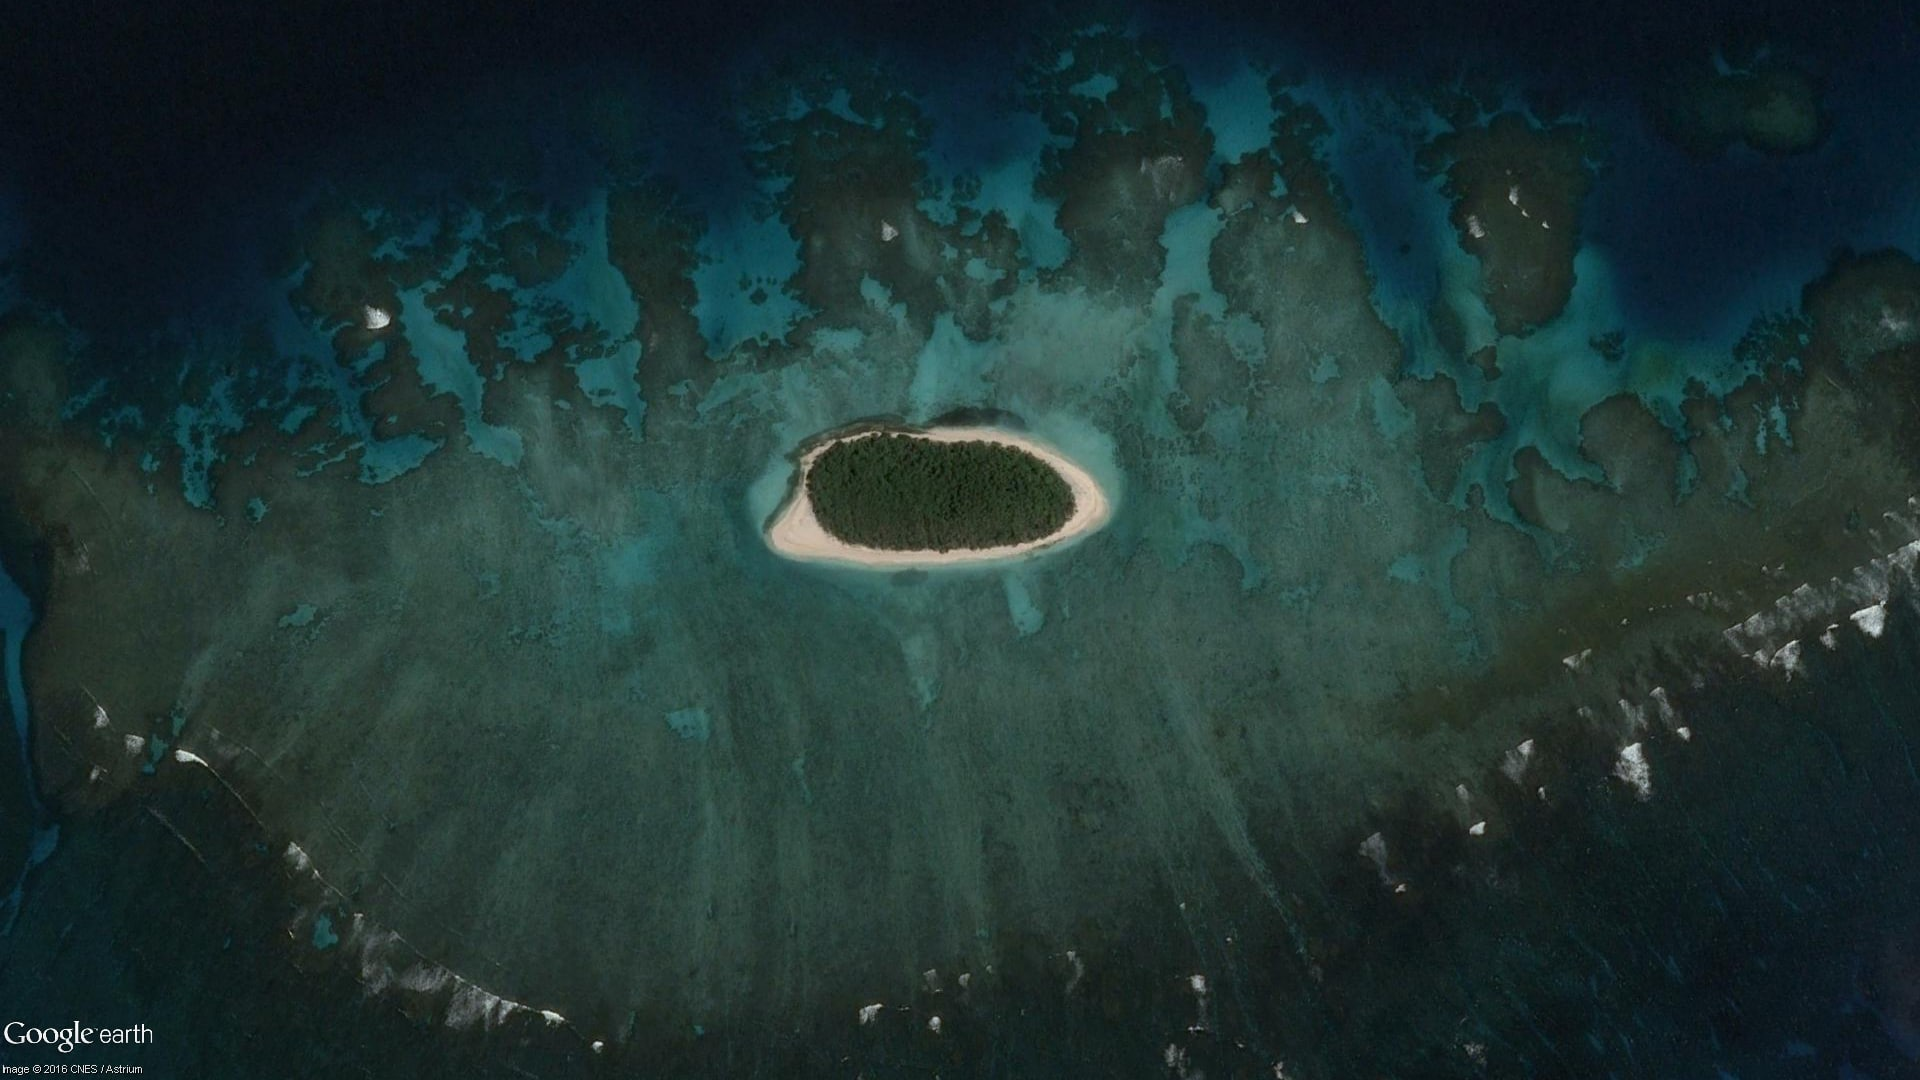 Making desktop backgrounds with Google Earth - Google